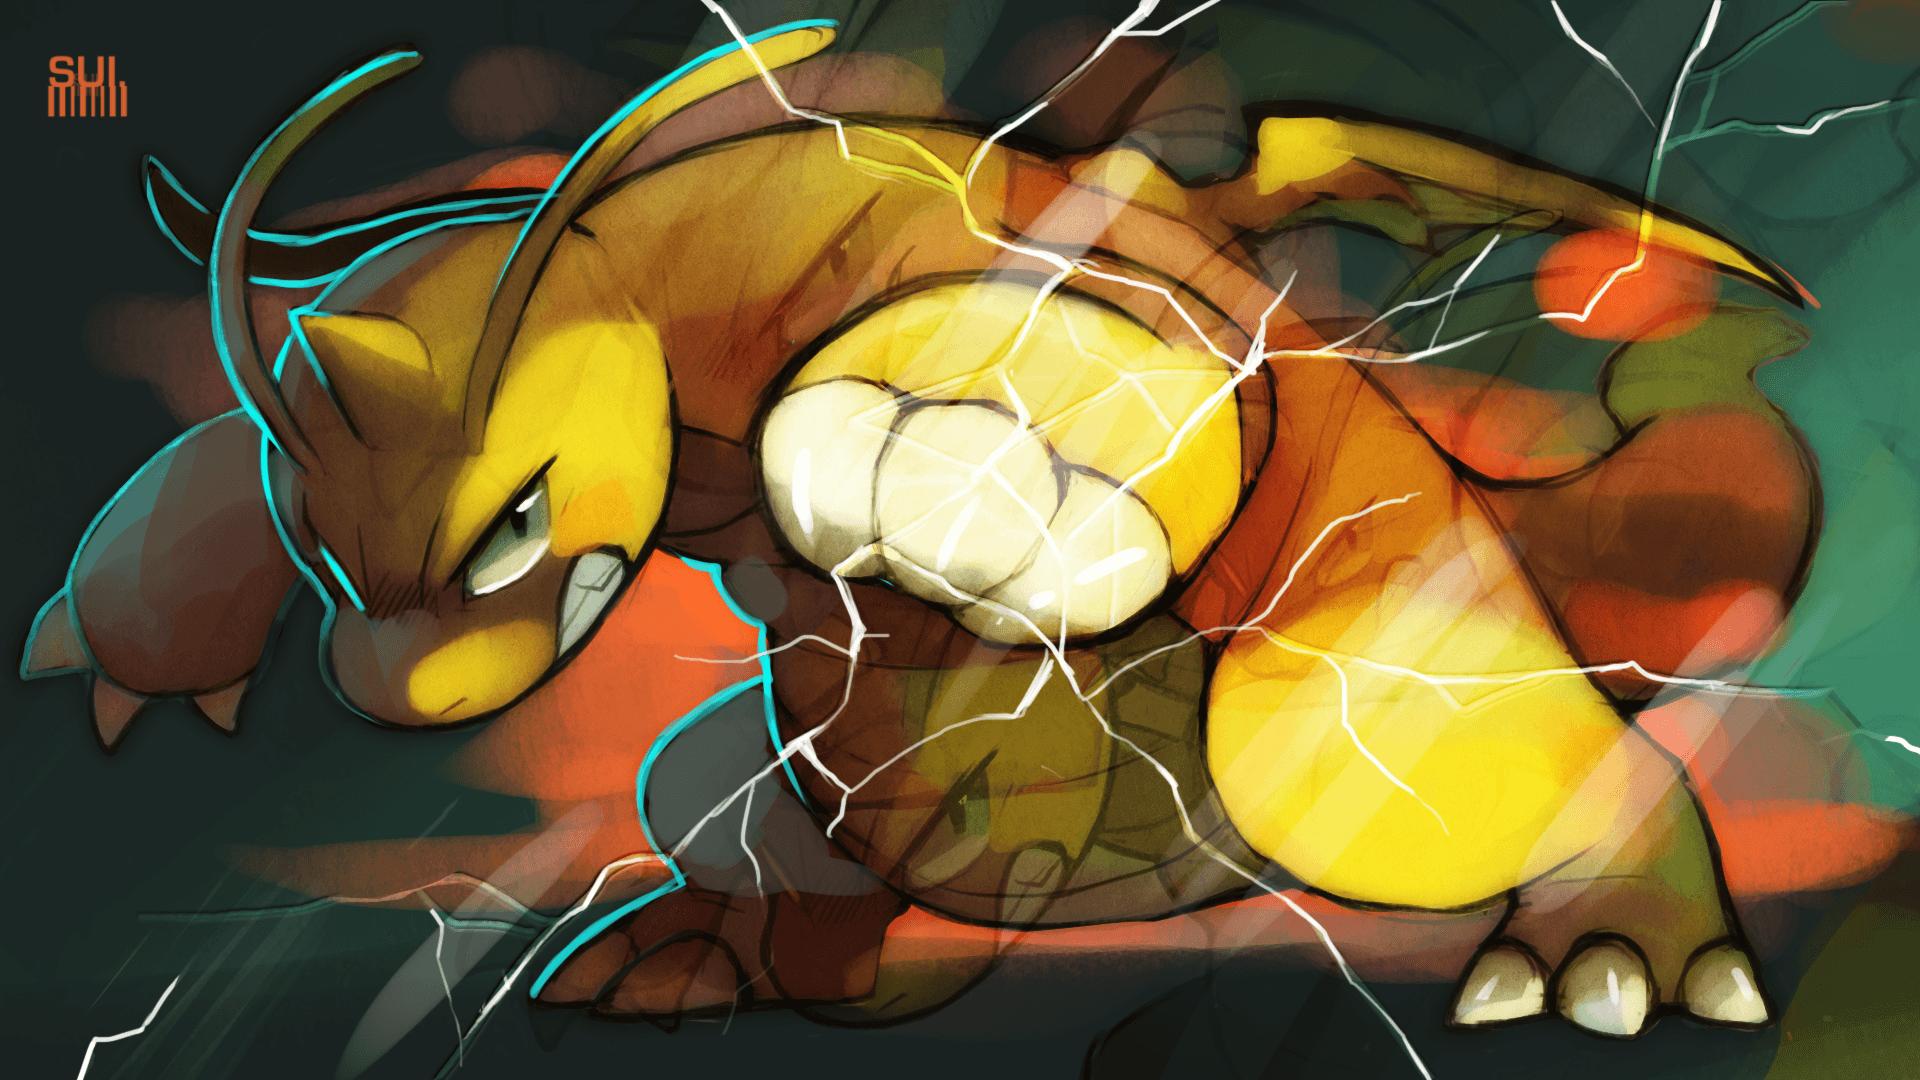 Pokemon Dragonite Wallpapers - Top Free Pokemon Dragonite Backgrounds -  WallpaperAccess